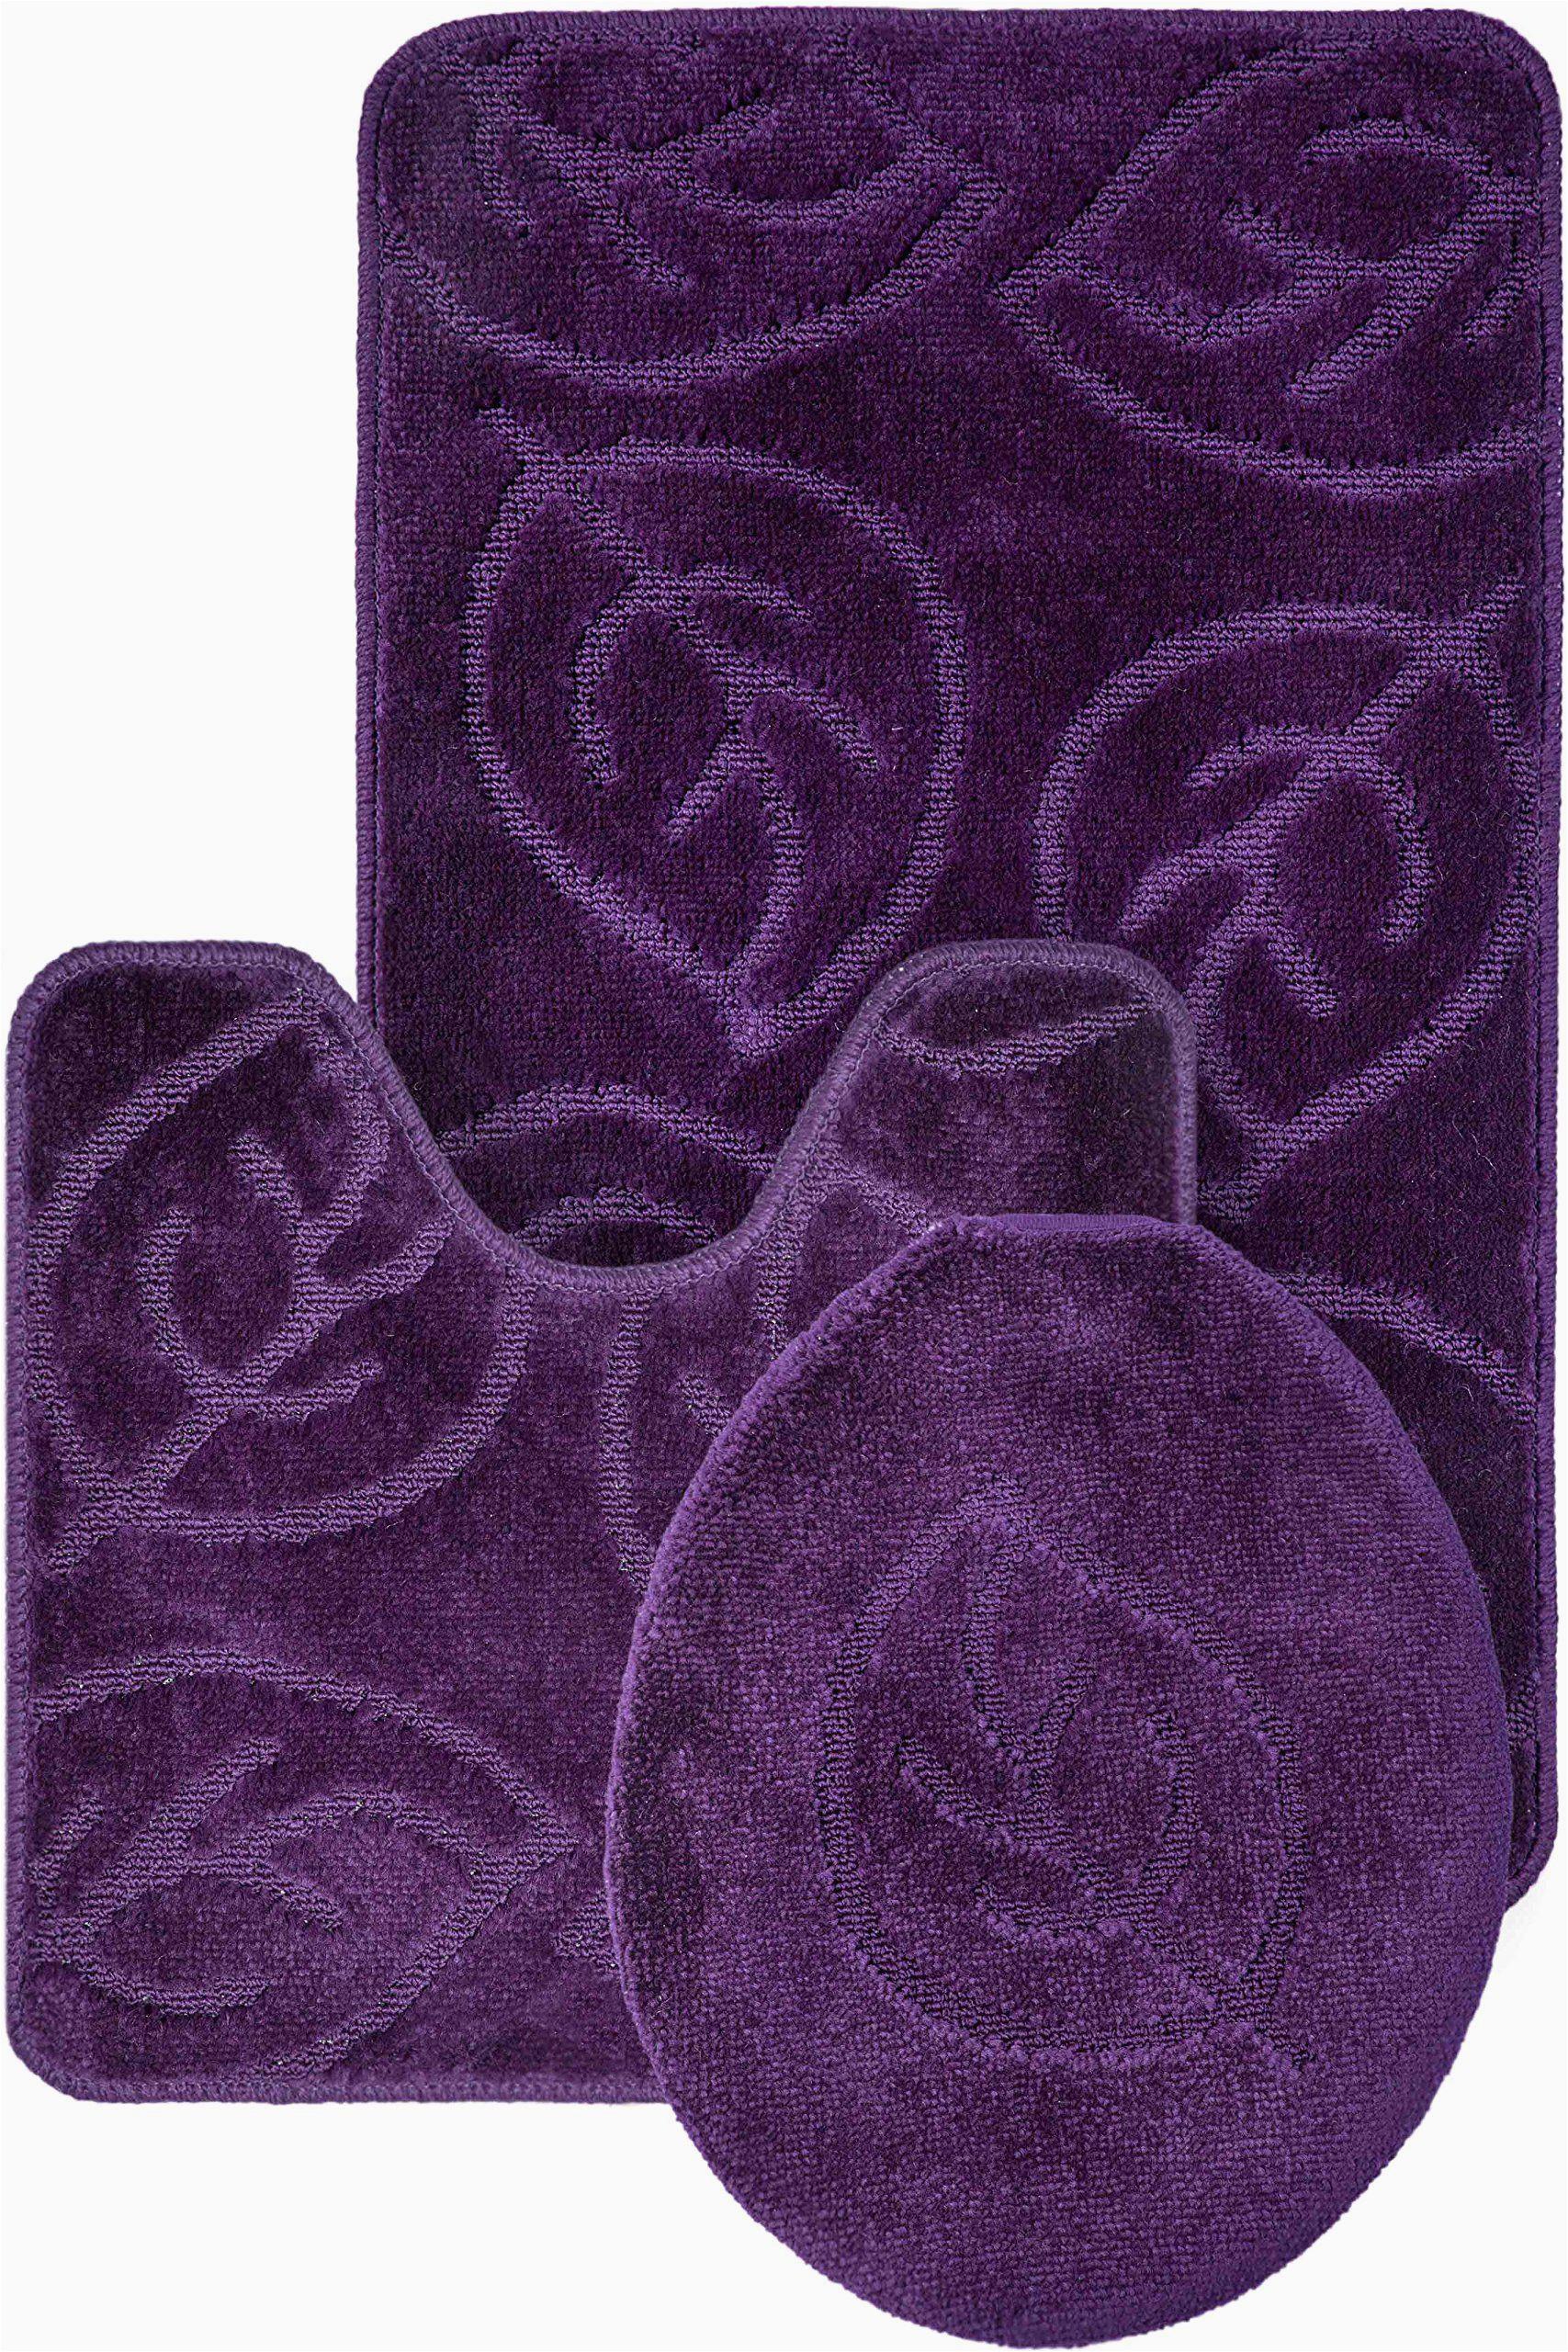 Deep Purple Bathroom Rugs Everdayspecial Purple Bath Set Leaf Pattern Bathroom Rug